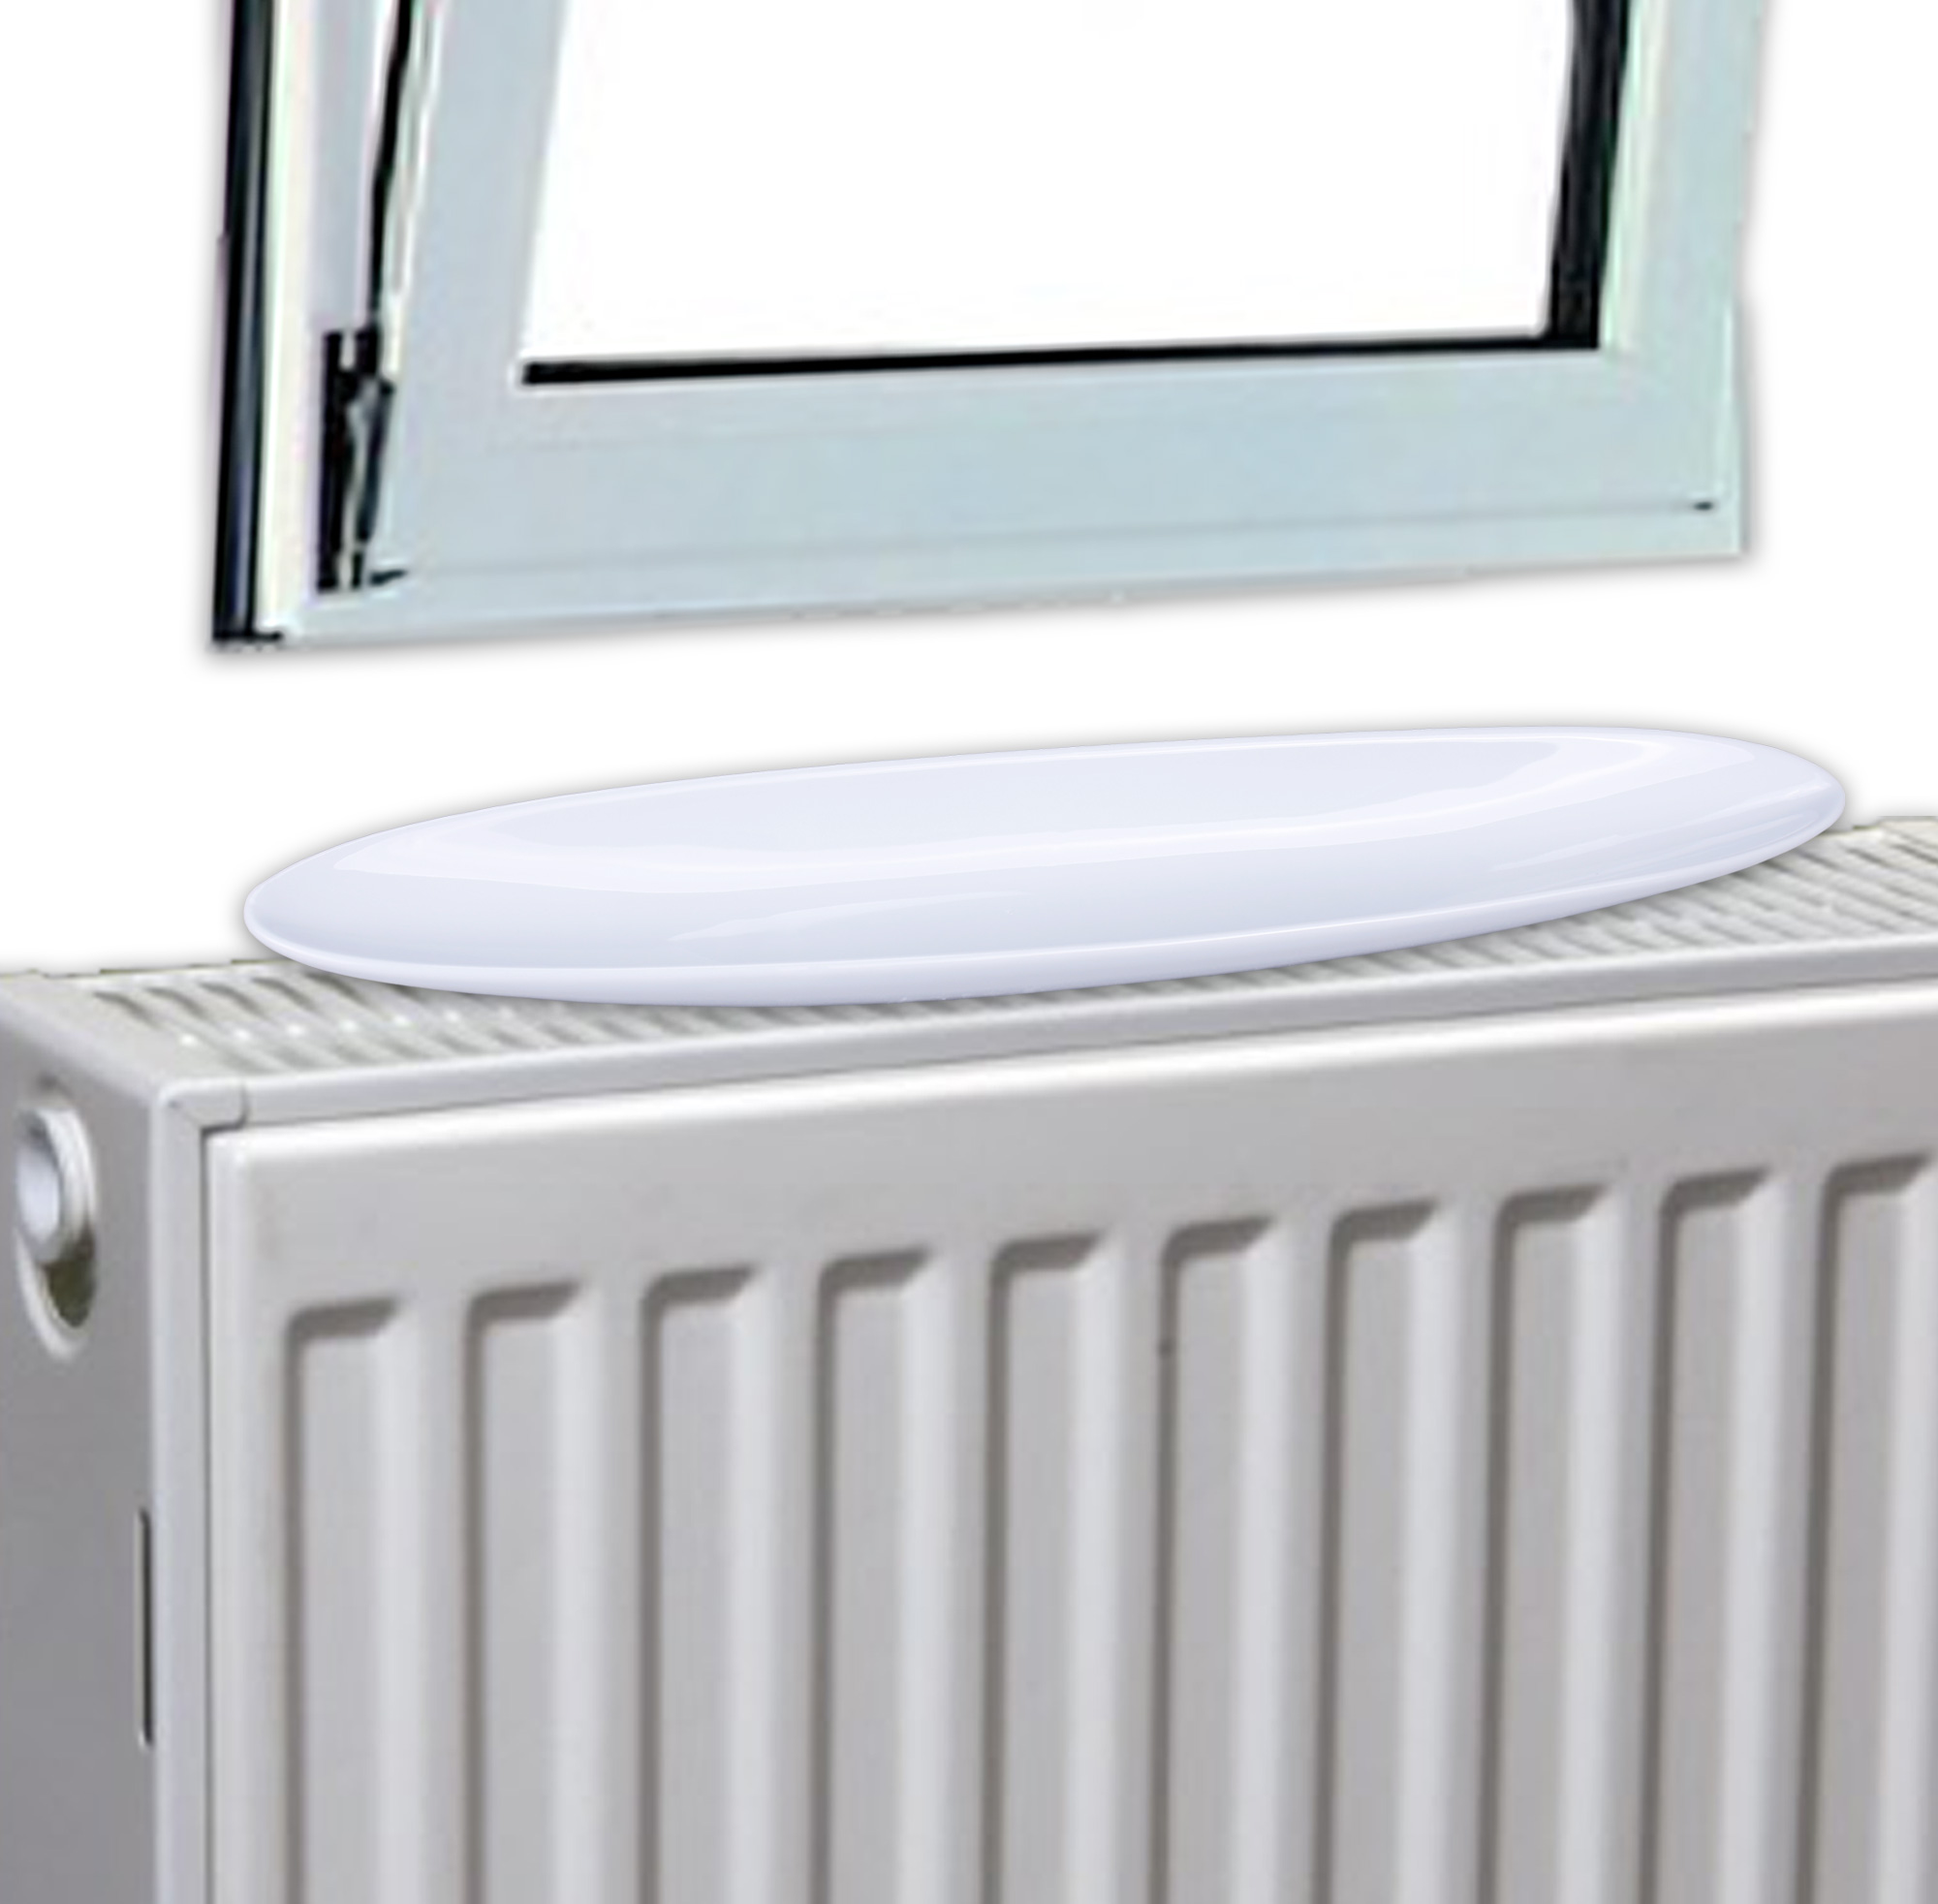 luftbefeuchter lufterfrischer raumbefeuchter. Black Bedroom Furniture Sets. Home Design Ideas